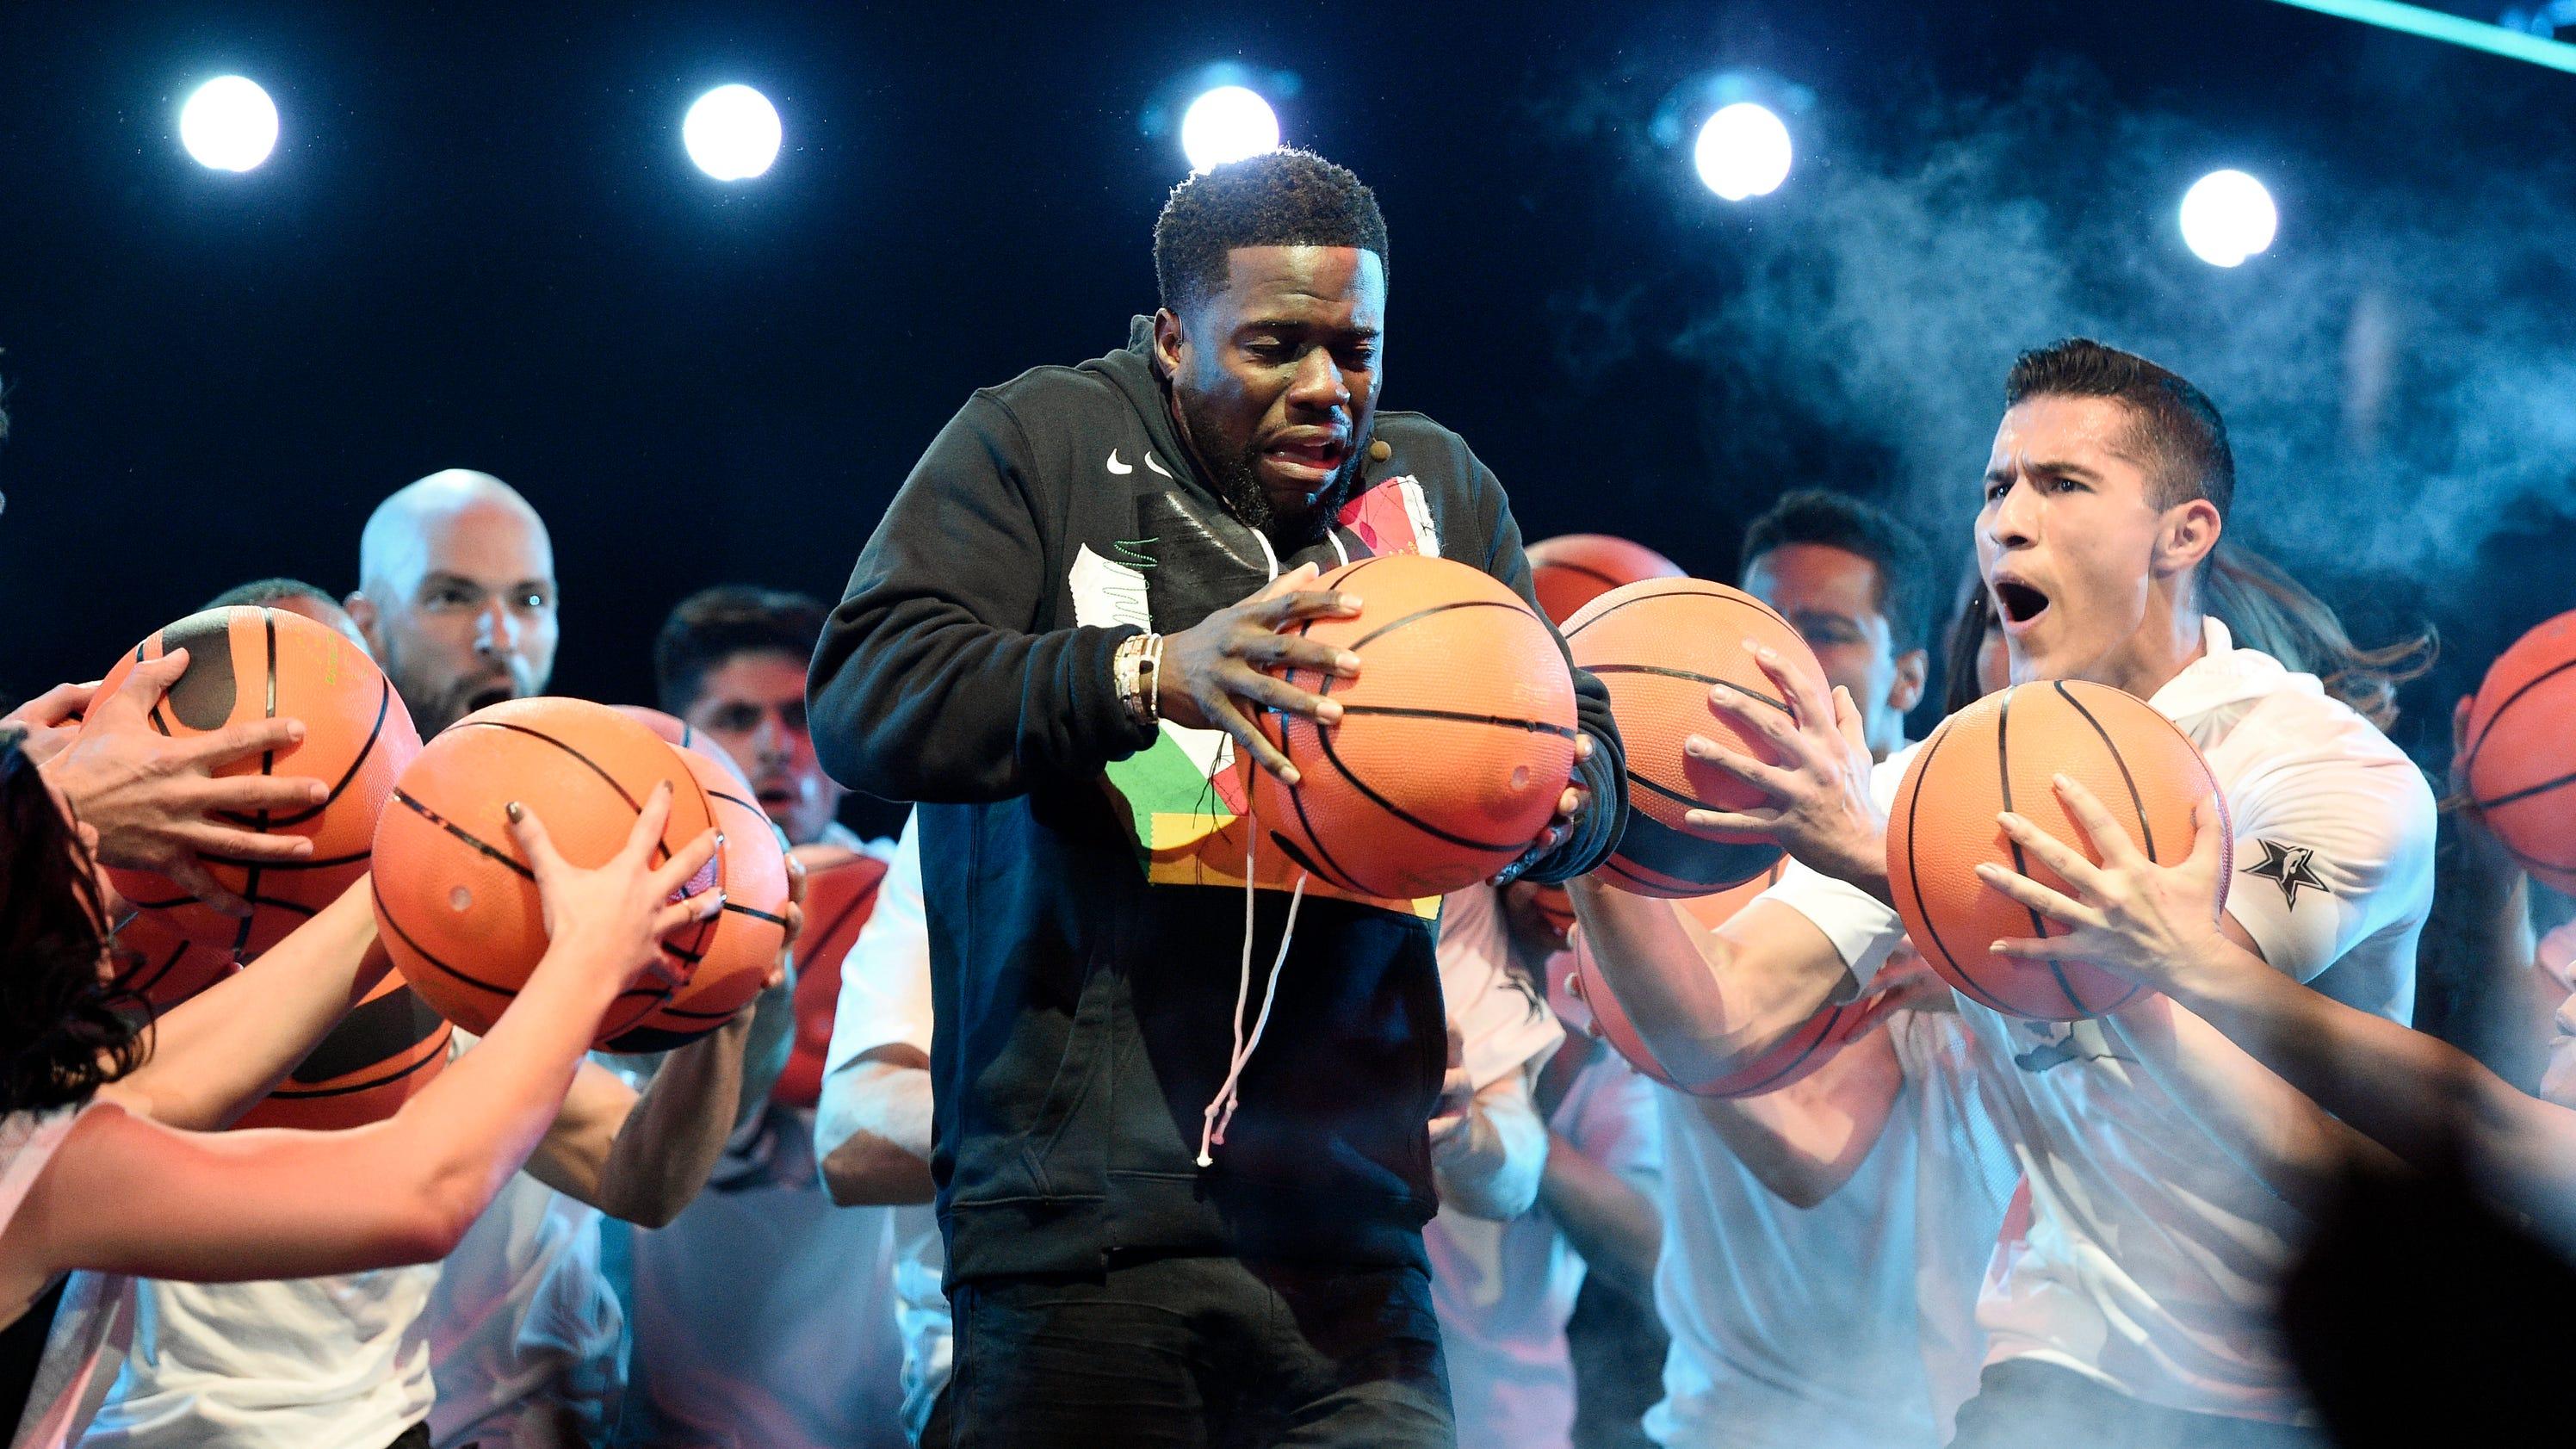 Ap_all_star_game_basketball_97672042